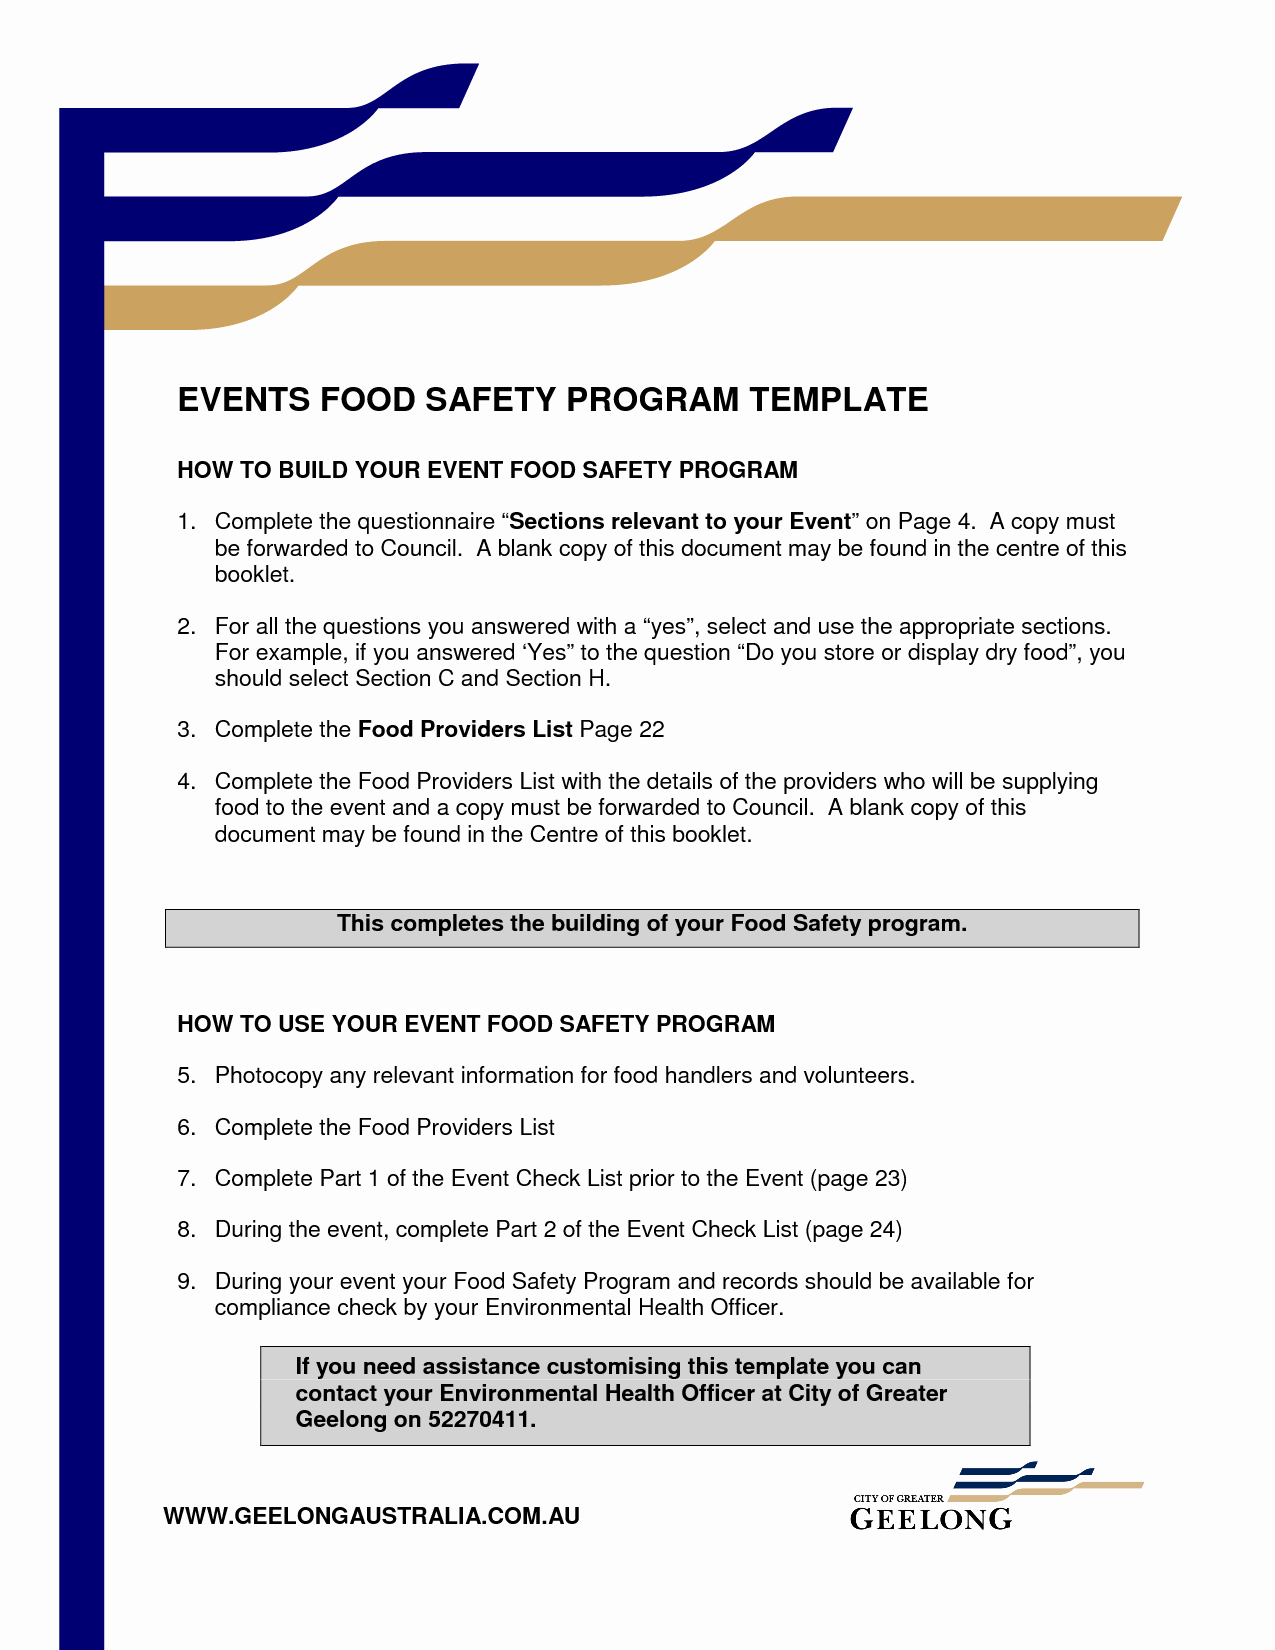 Event Program Template Word Fresh event Program Template